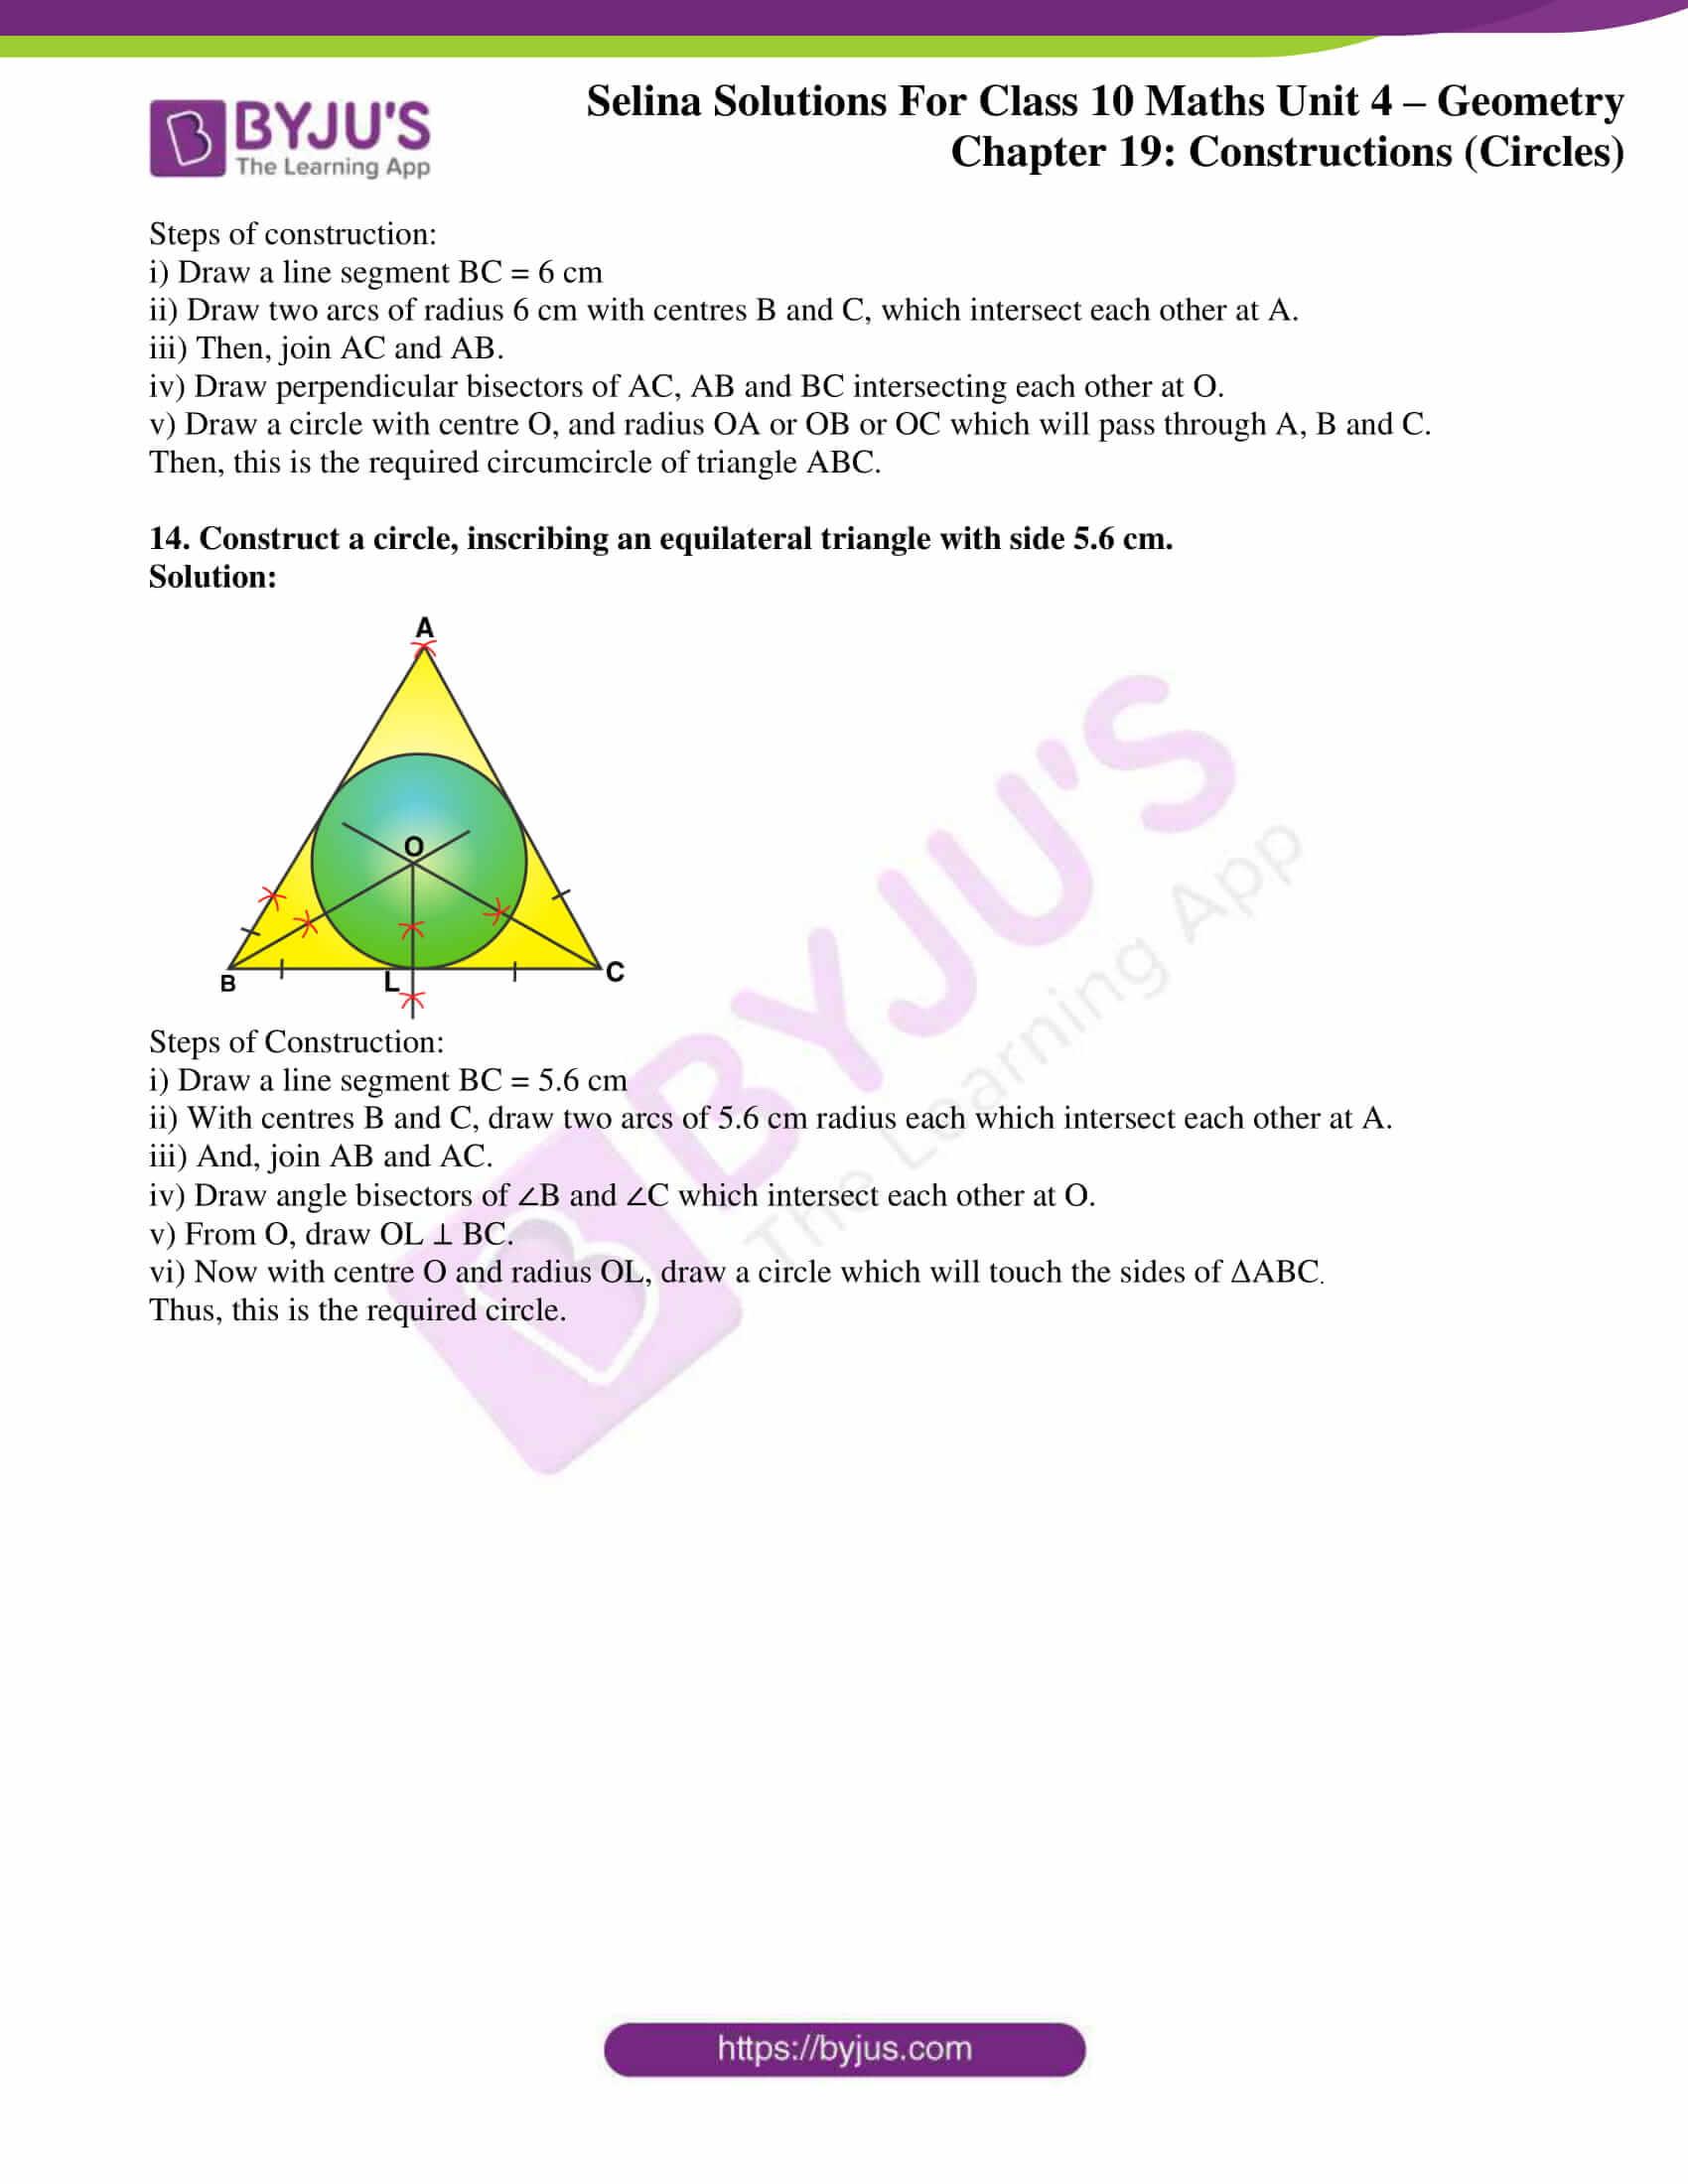 selina-sol-maths-class-10-ch-19-8